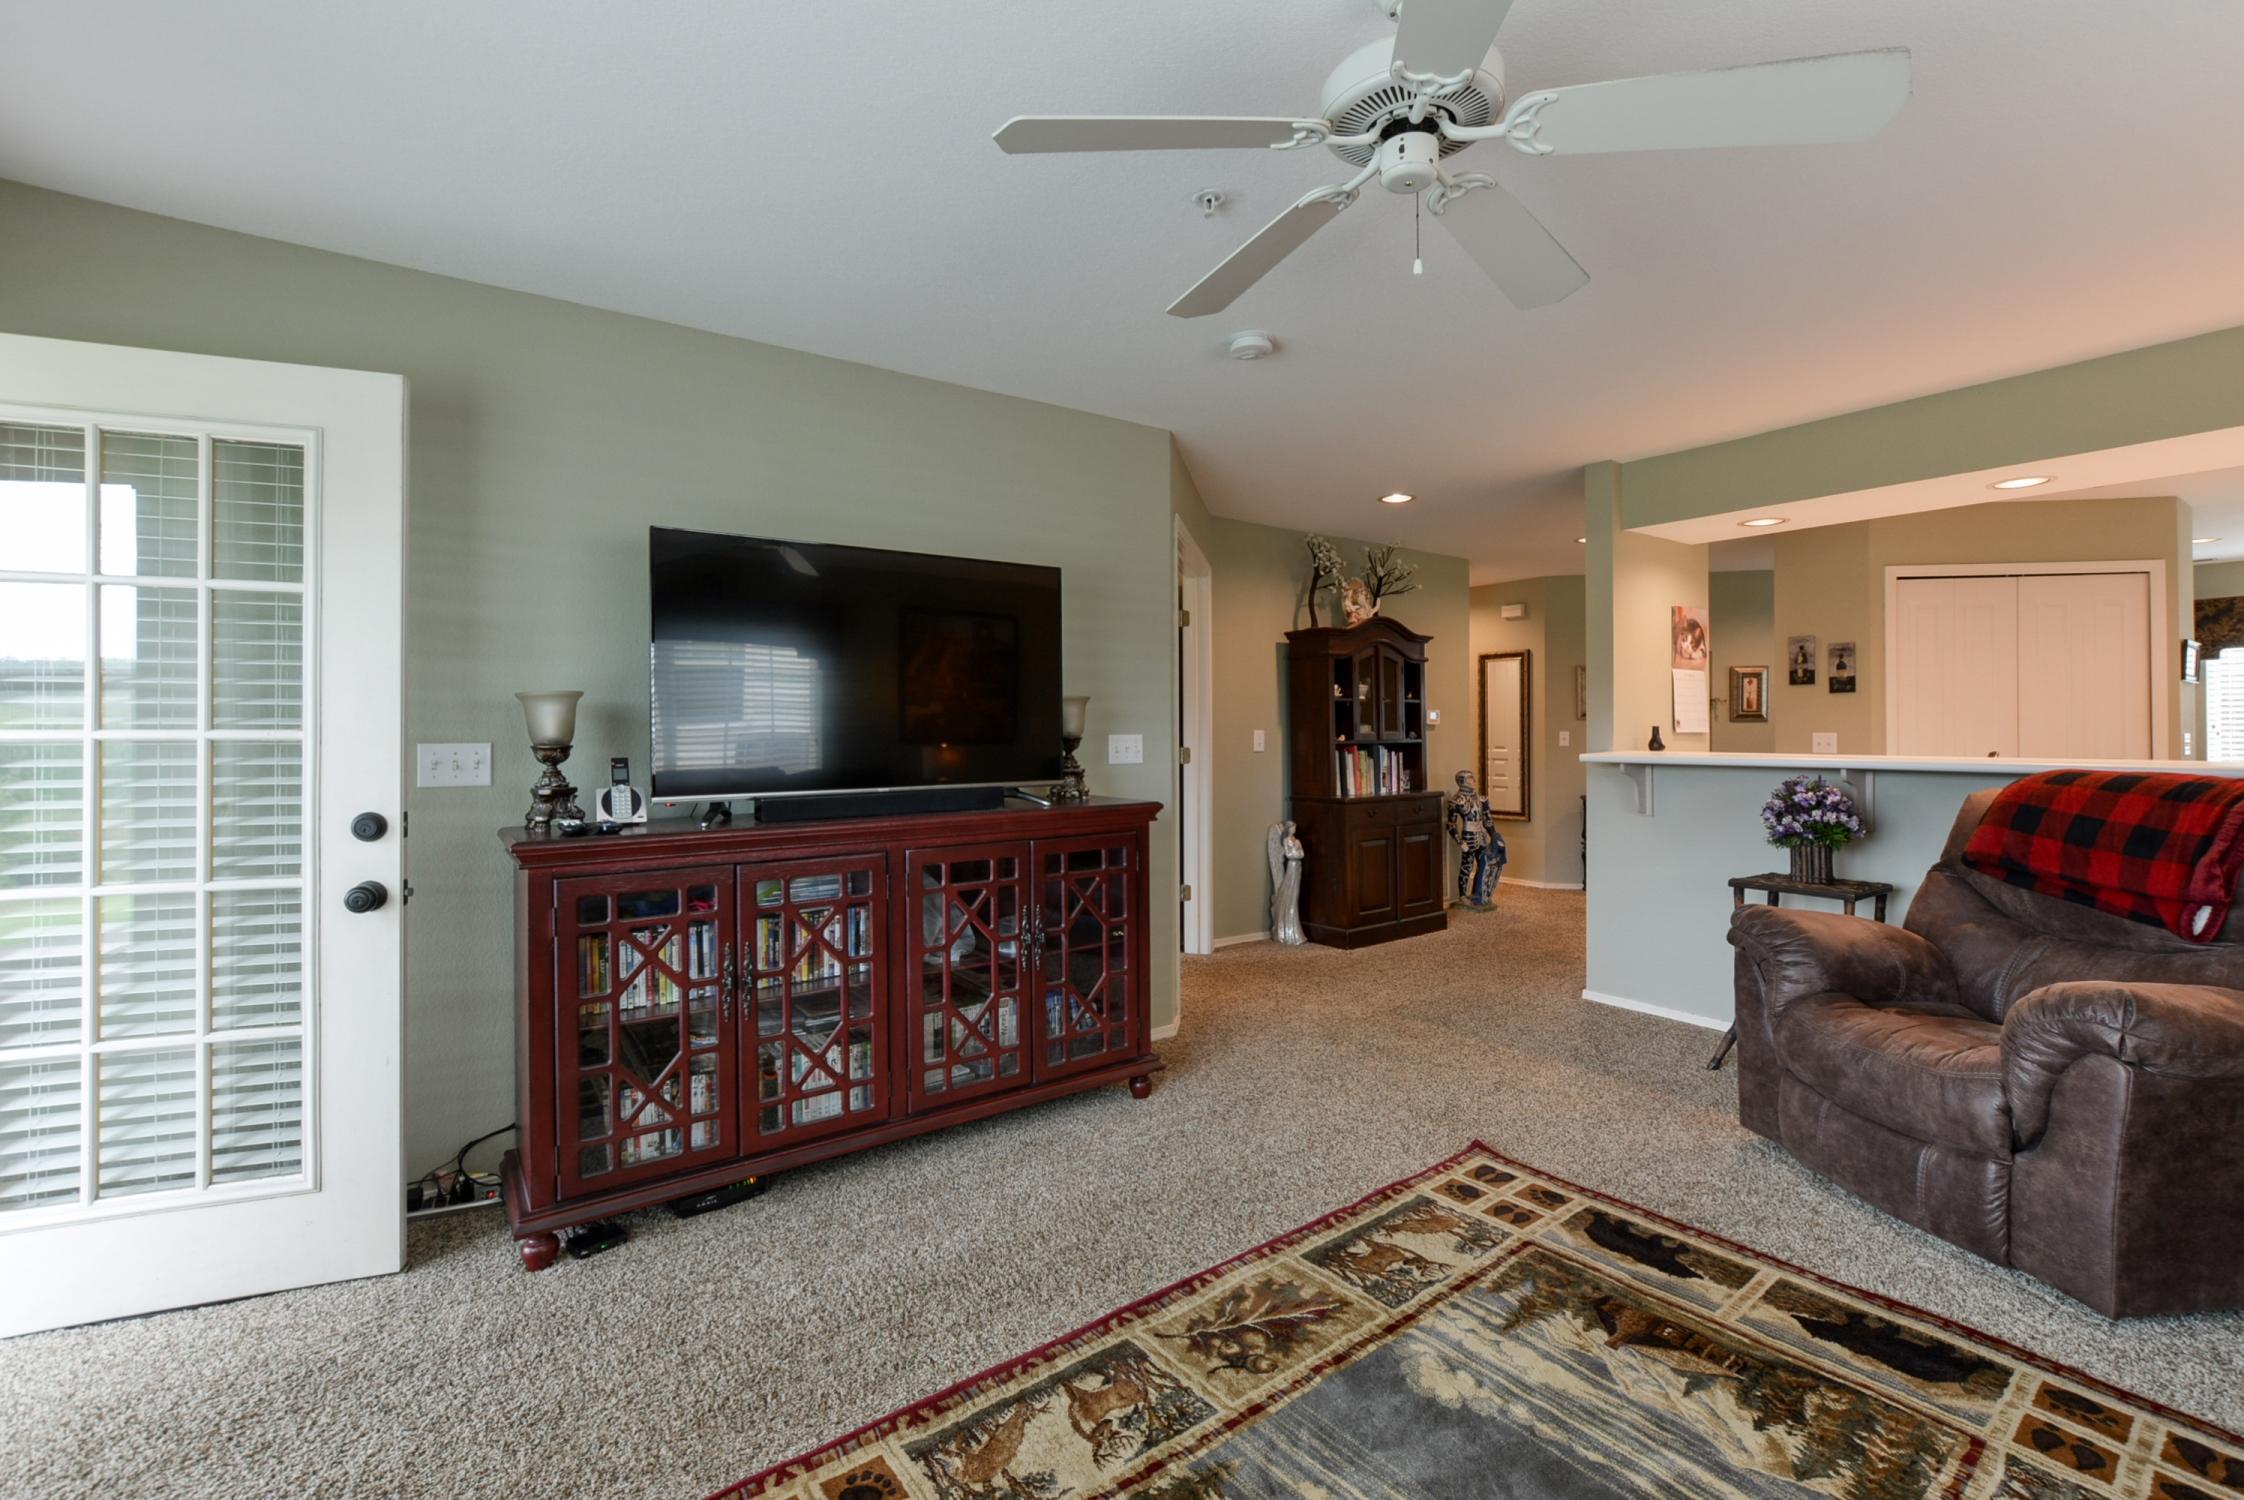 351 South Wildwood Drive 8-1 Branson, MO 65616